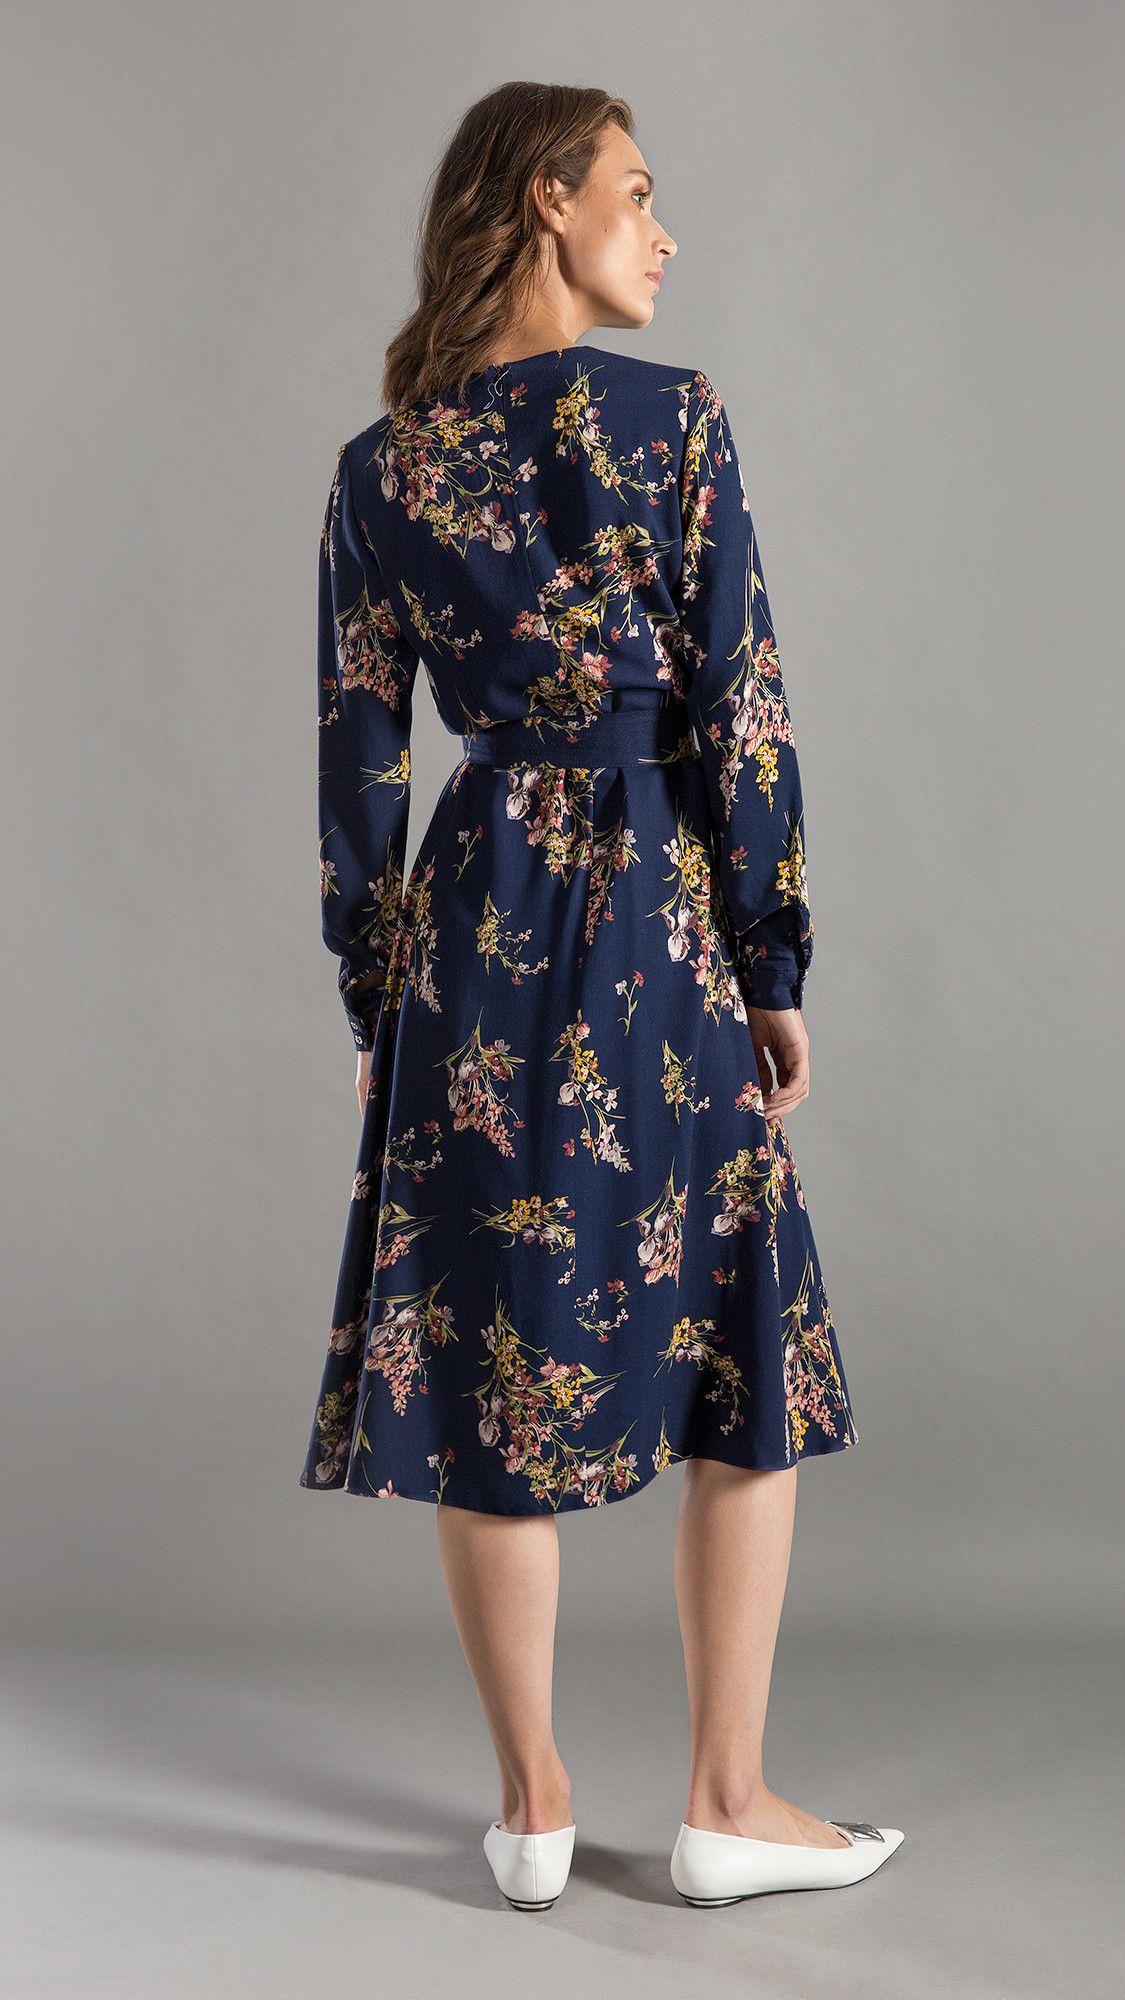 Dress Minnie Floral Navy